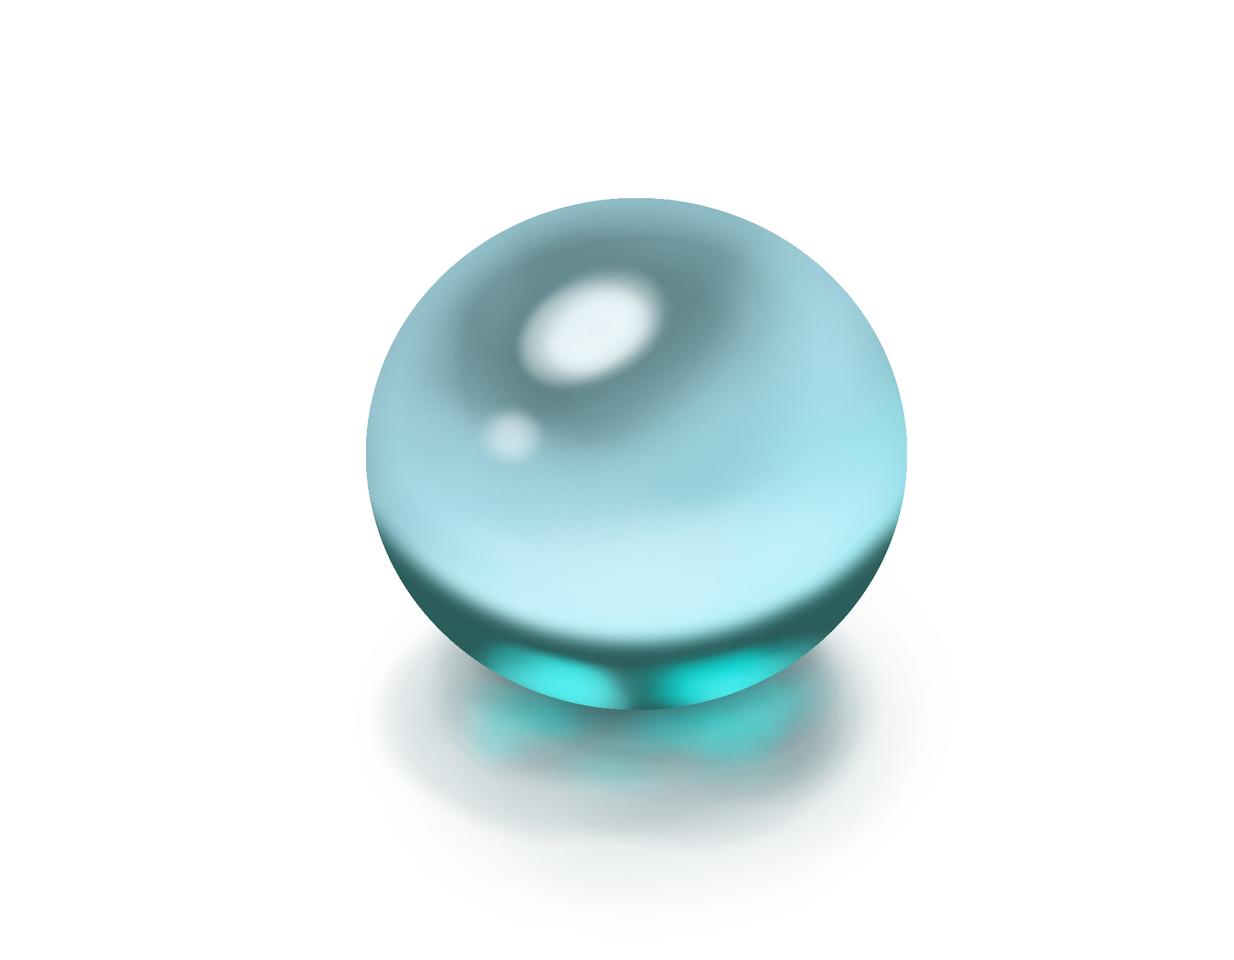 水晶球 Illust of Pai-Paint4234 水晶球